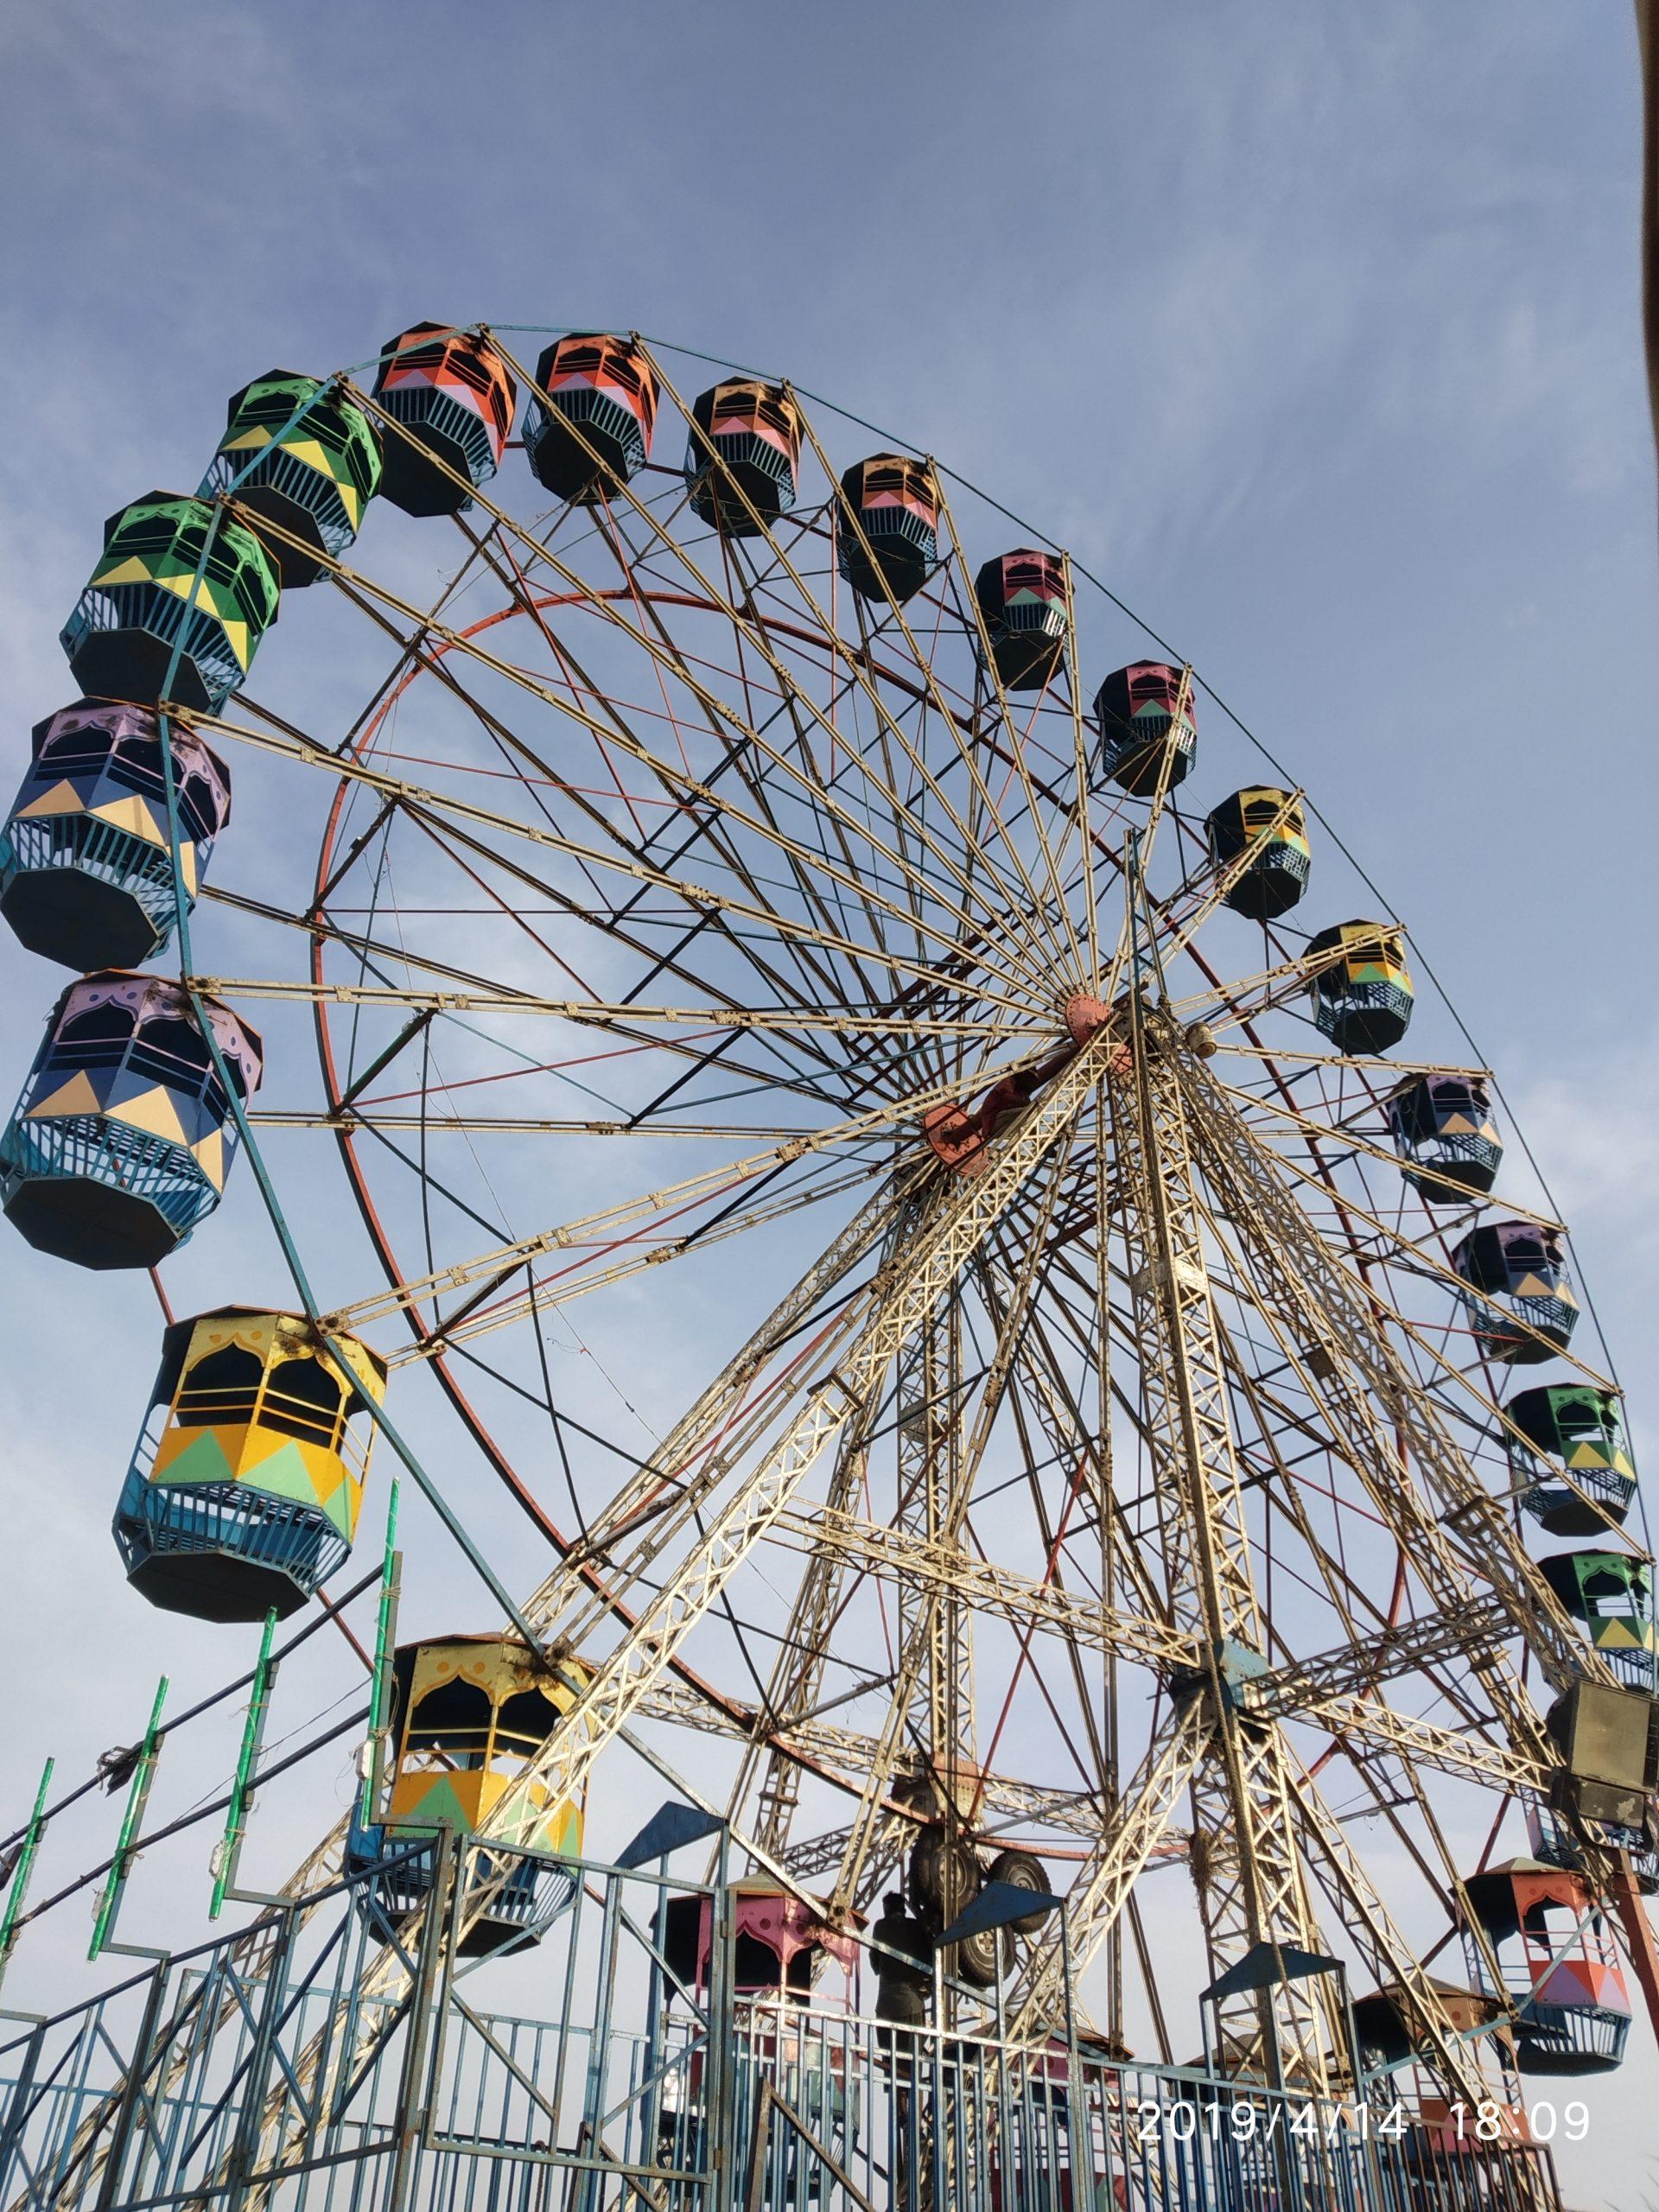 Ferris Wheel in an amusement park